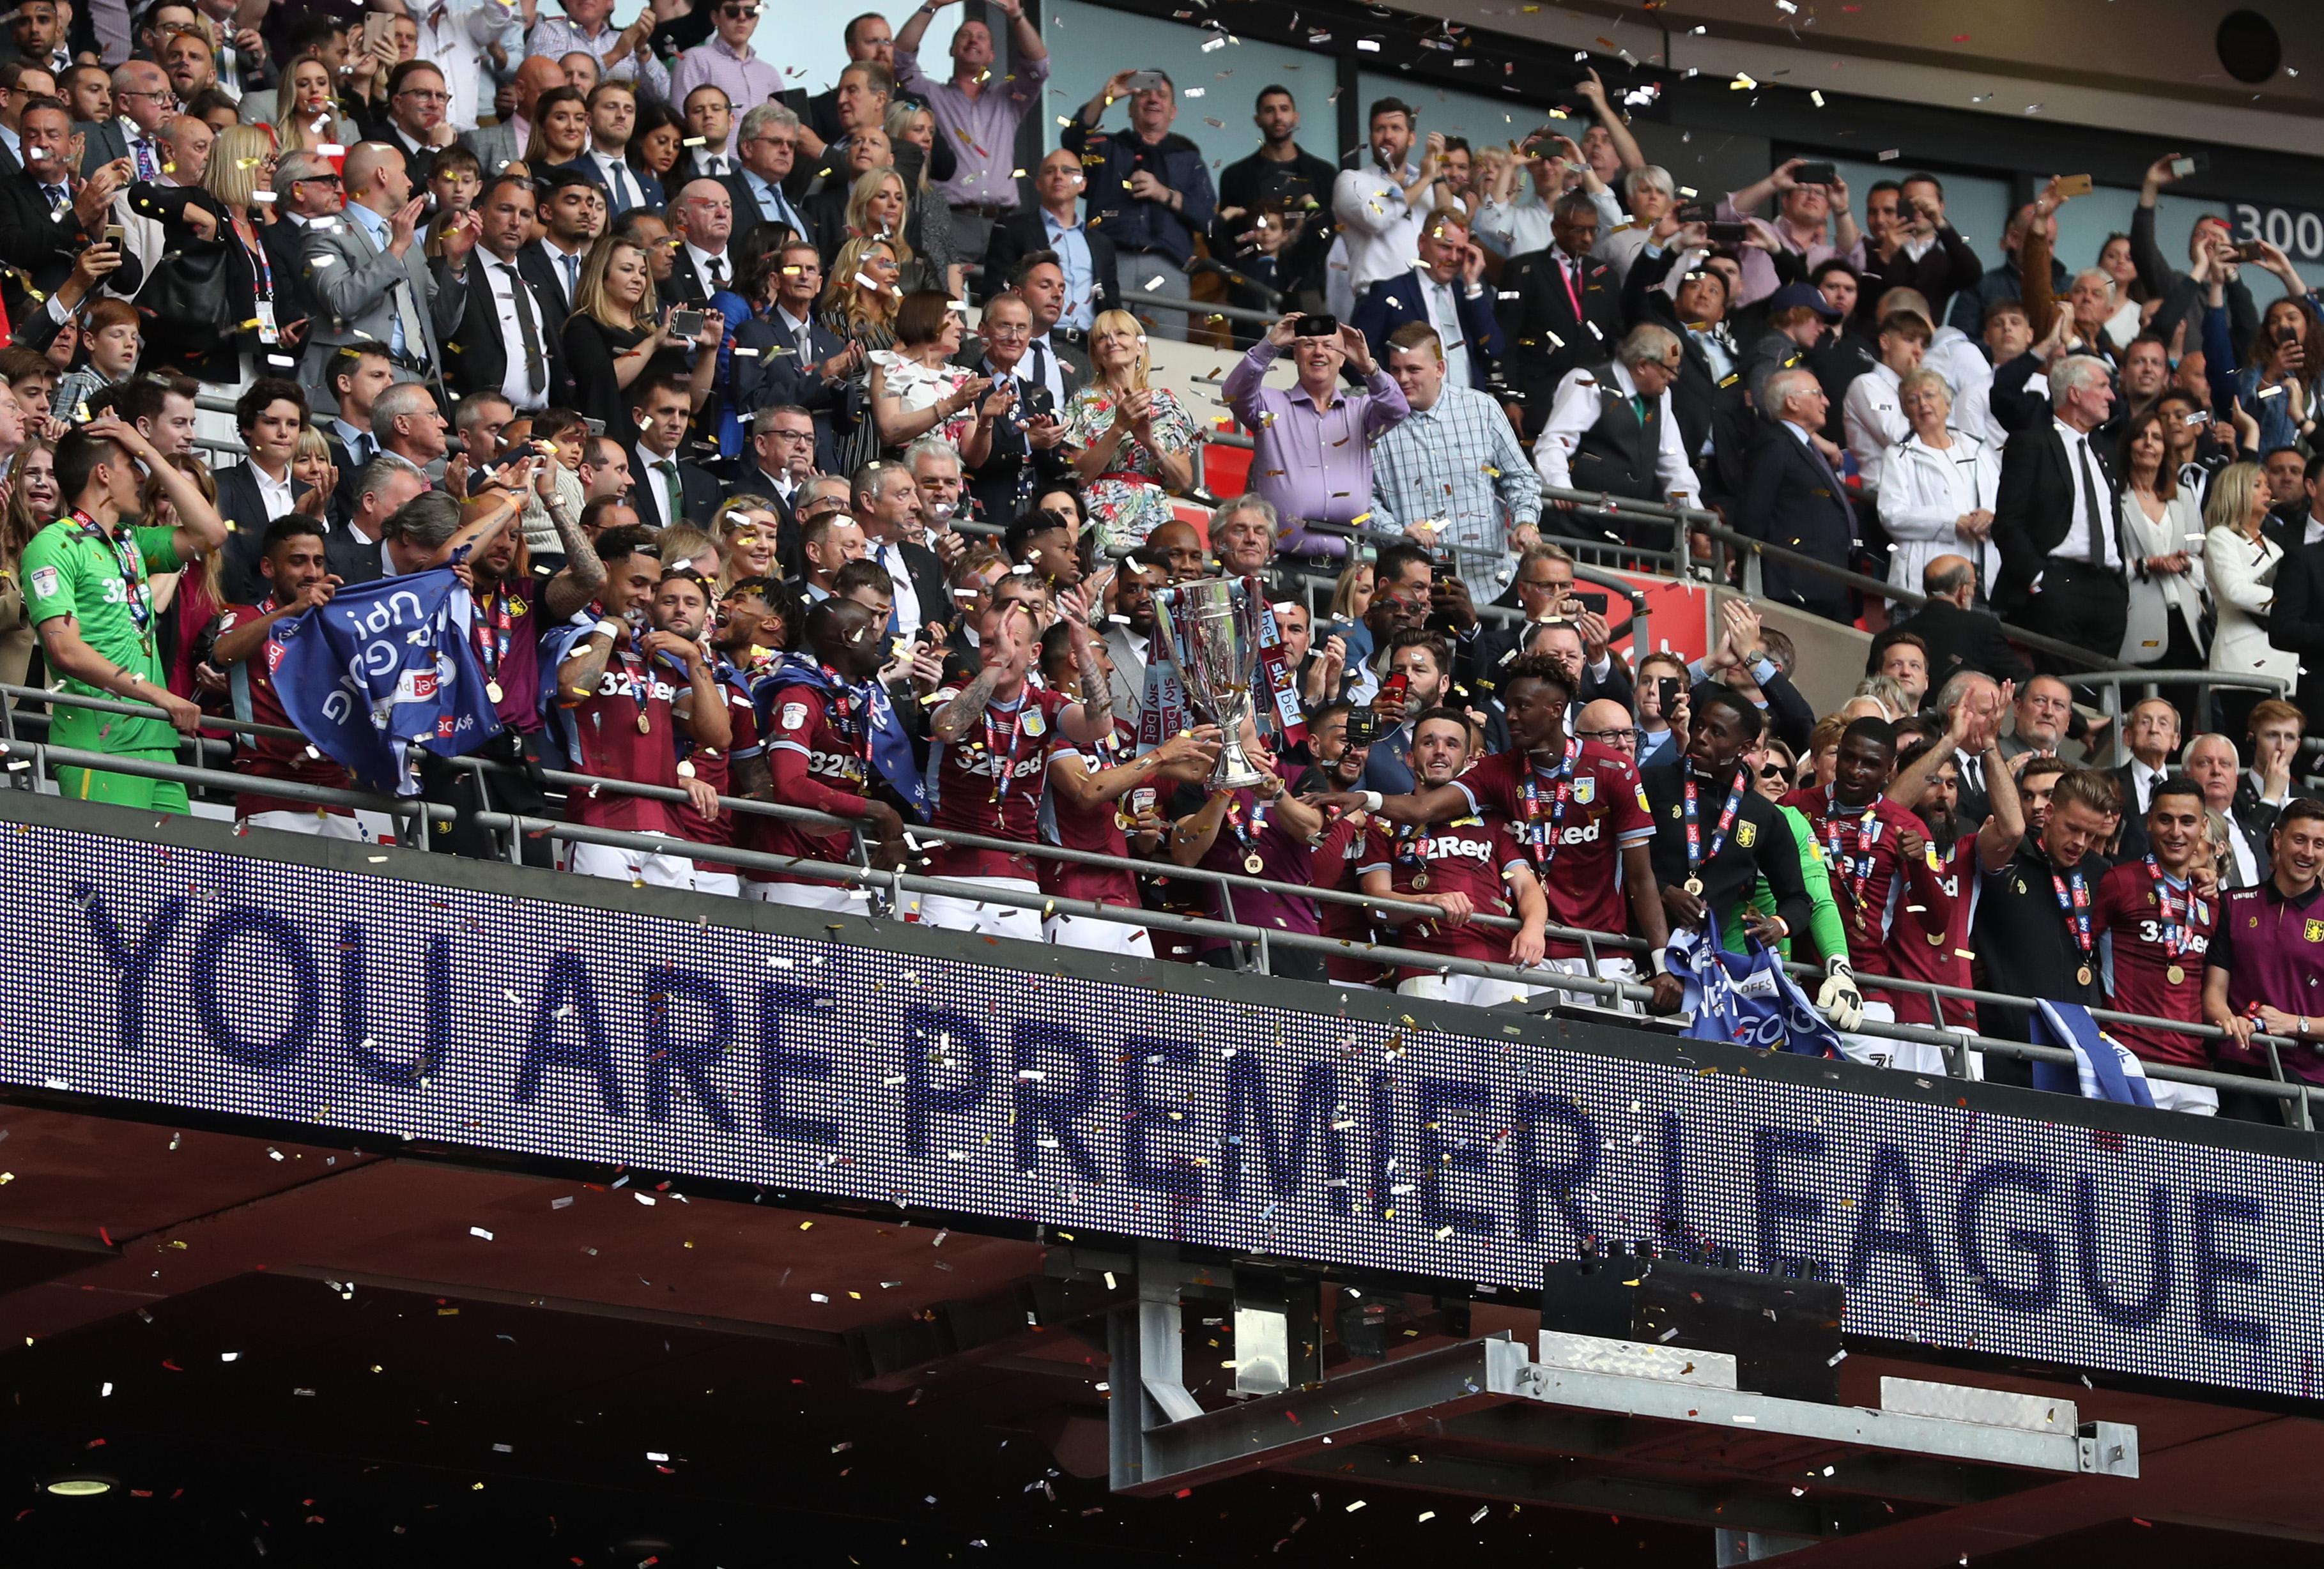 Aston Villa lift the trophy - Aston Villa v Derby County - EFL Championship Playoff Final - Wembley